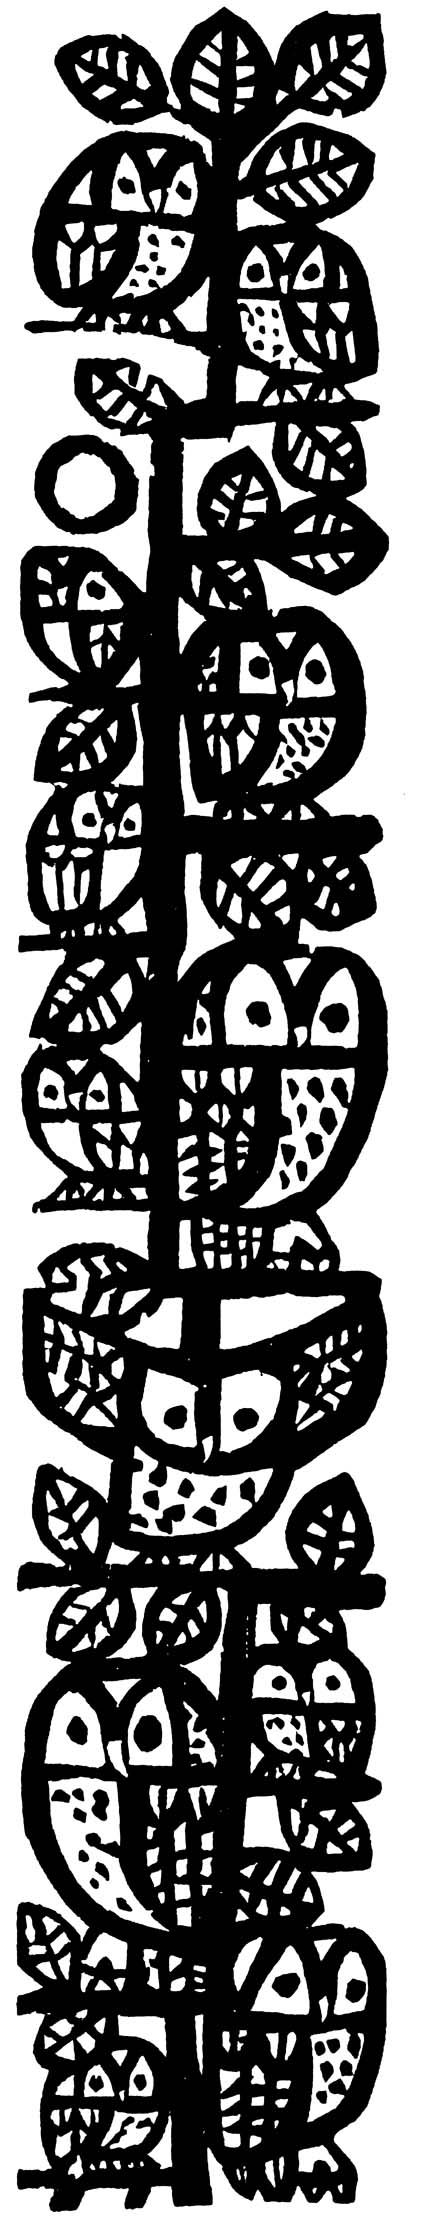 owls by Celestino Piatti (ca. 1970)